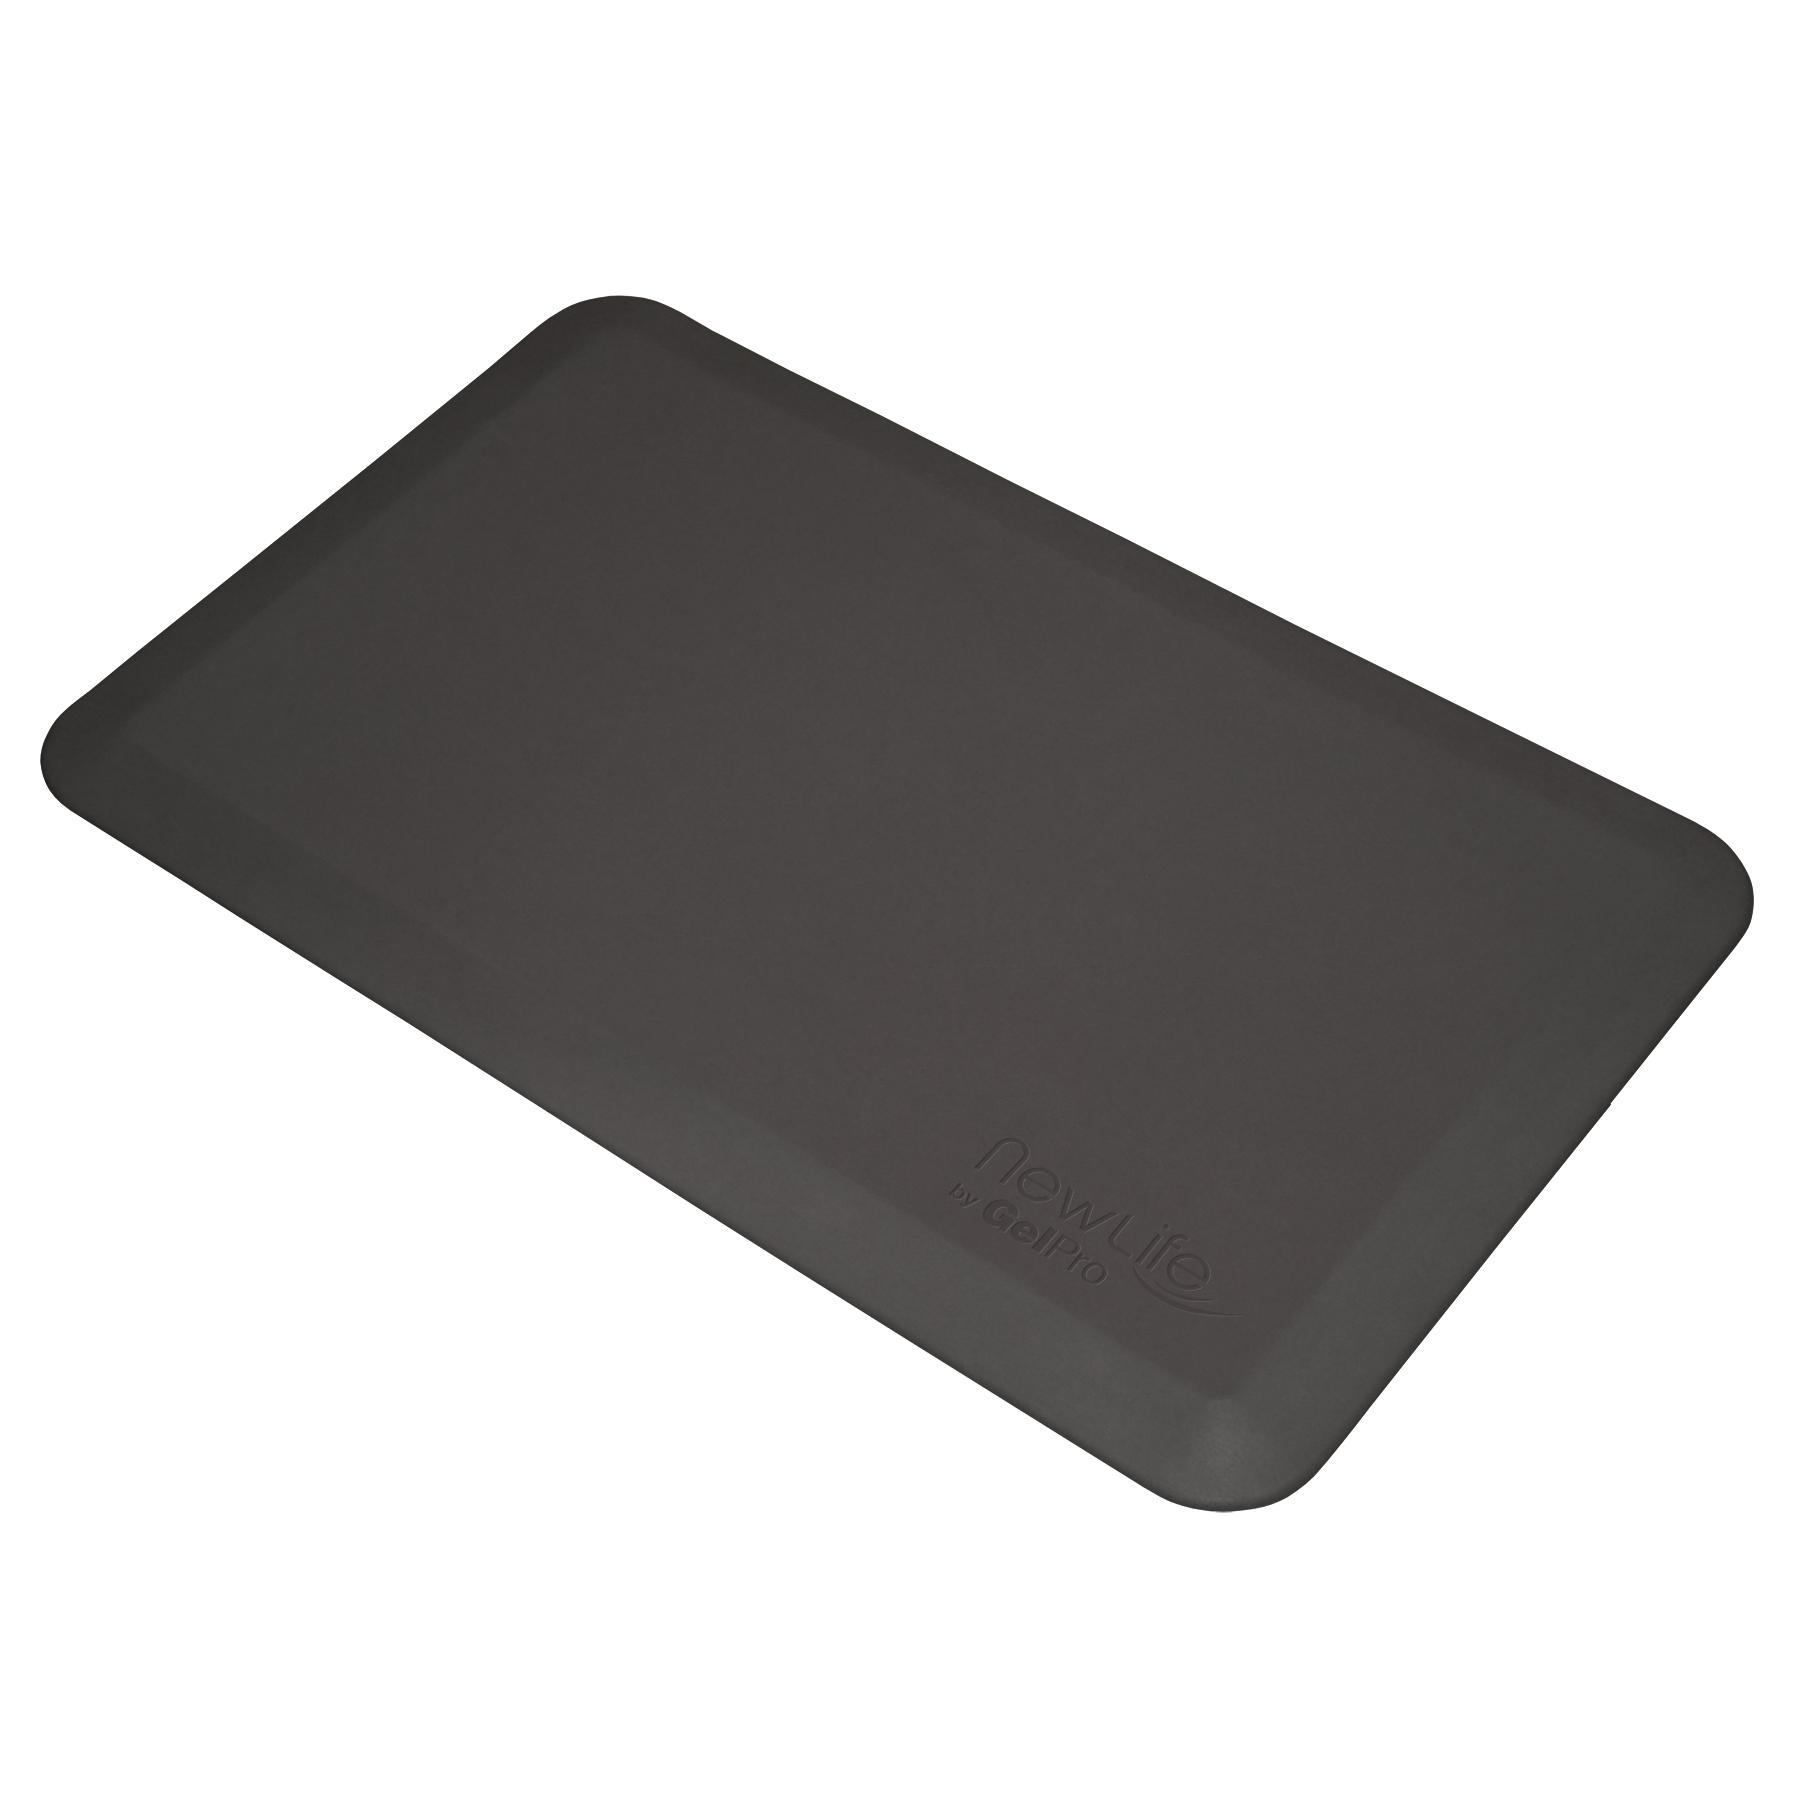 filled comfort diagram elite floor gallery collapse mats in fashionable shop styles elegant gel gelpro mat